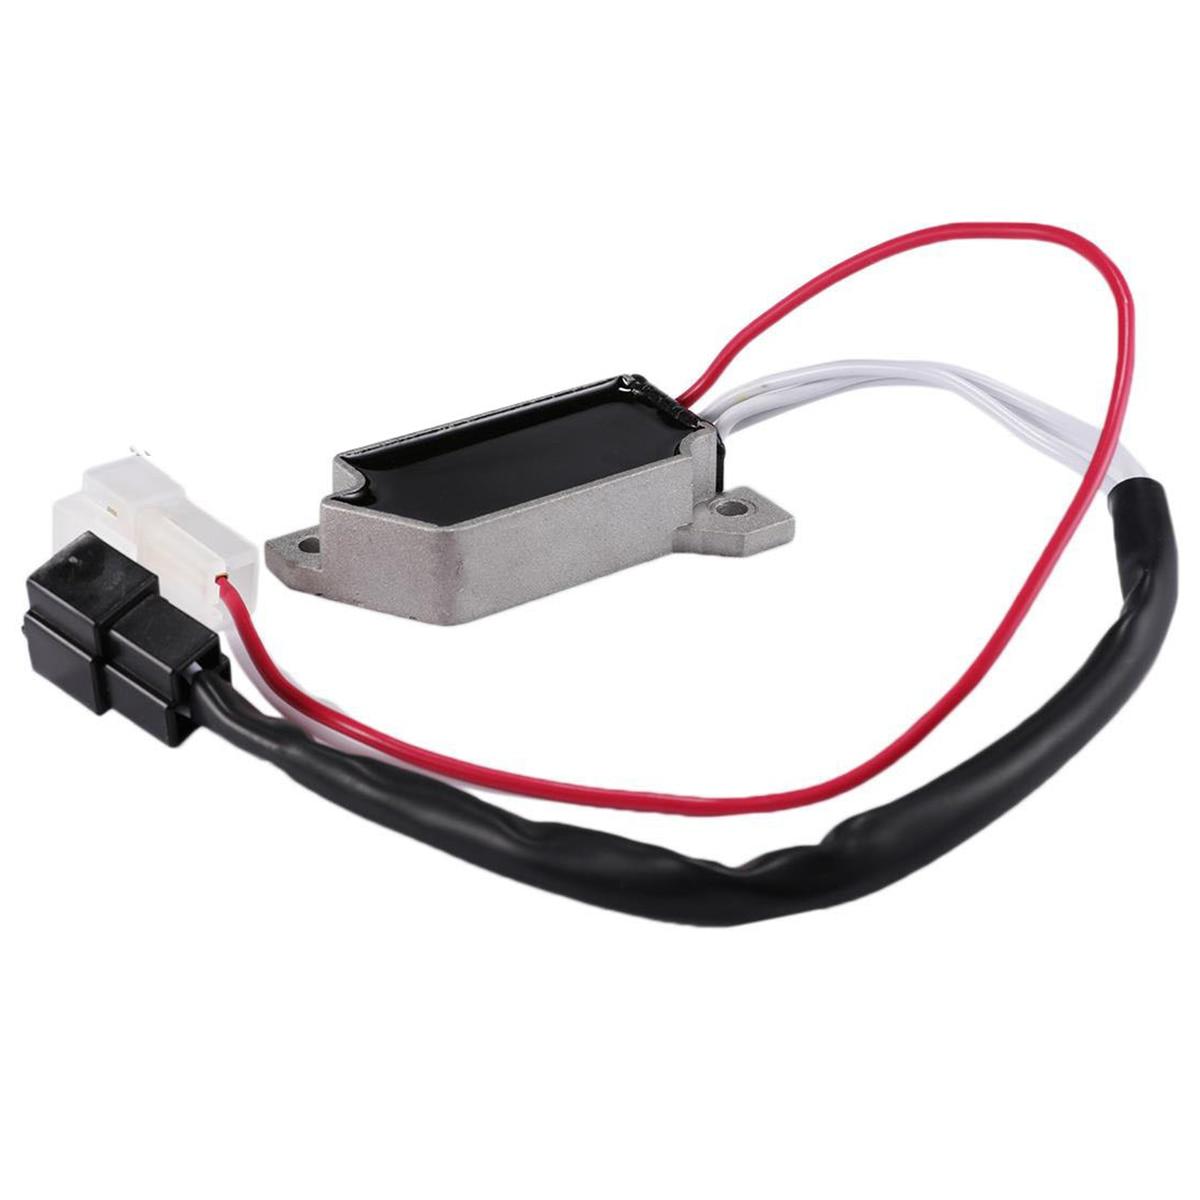 Voltage Regulator For Yamaha FZR400 88-90 FZR500 89-93 FZR600 Genesis 89-93